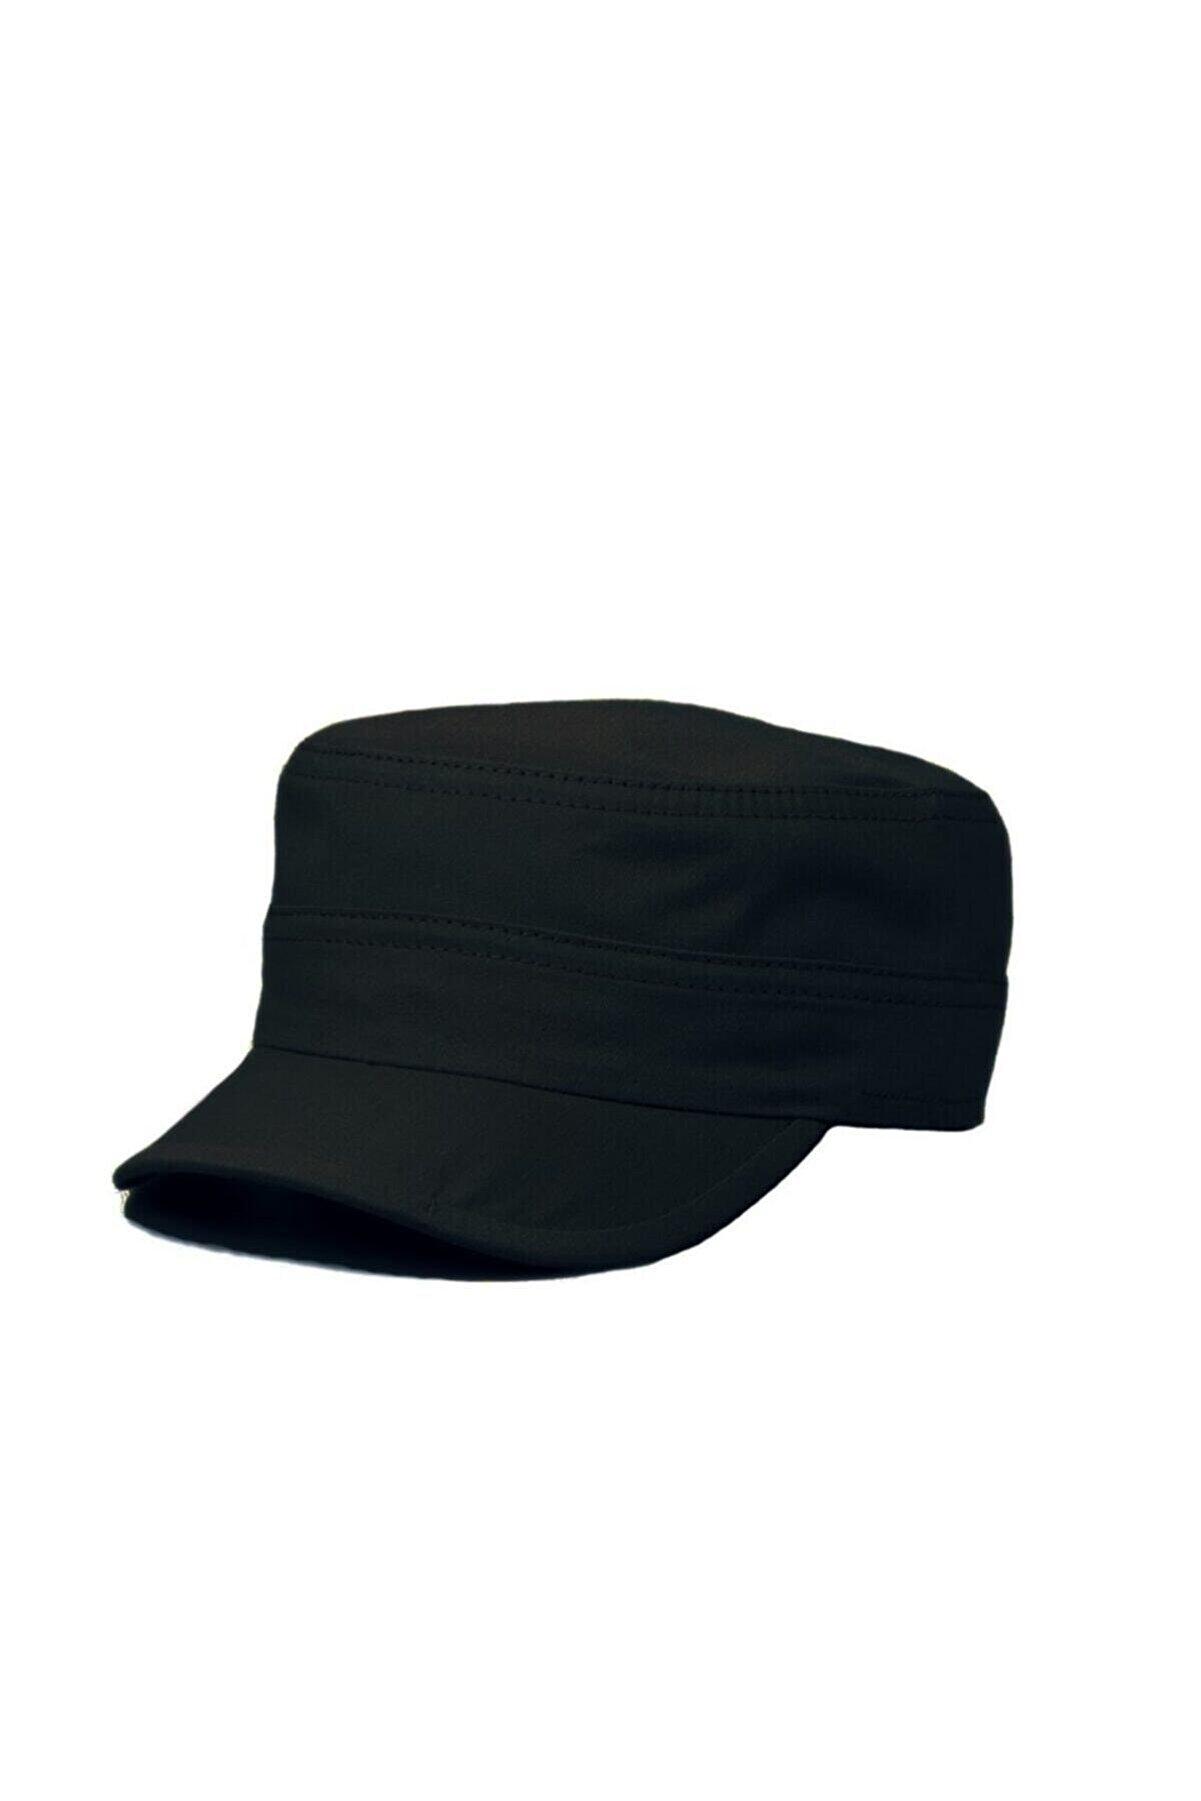 SYT Castro Şapka Kep Avcı Model